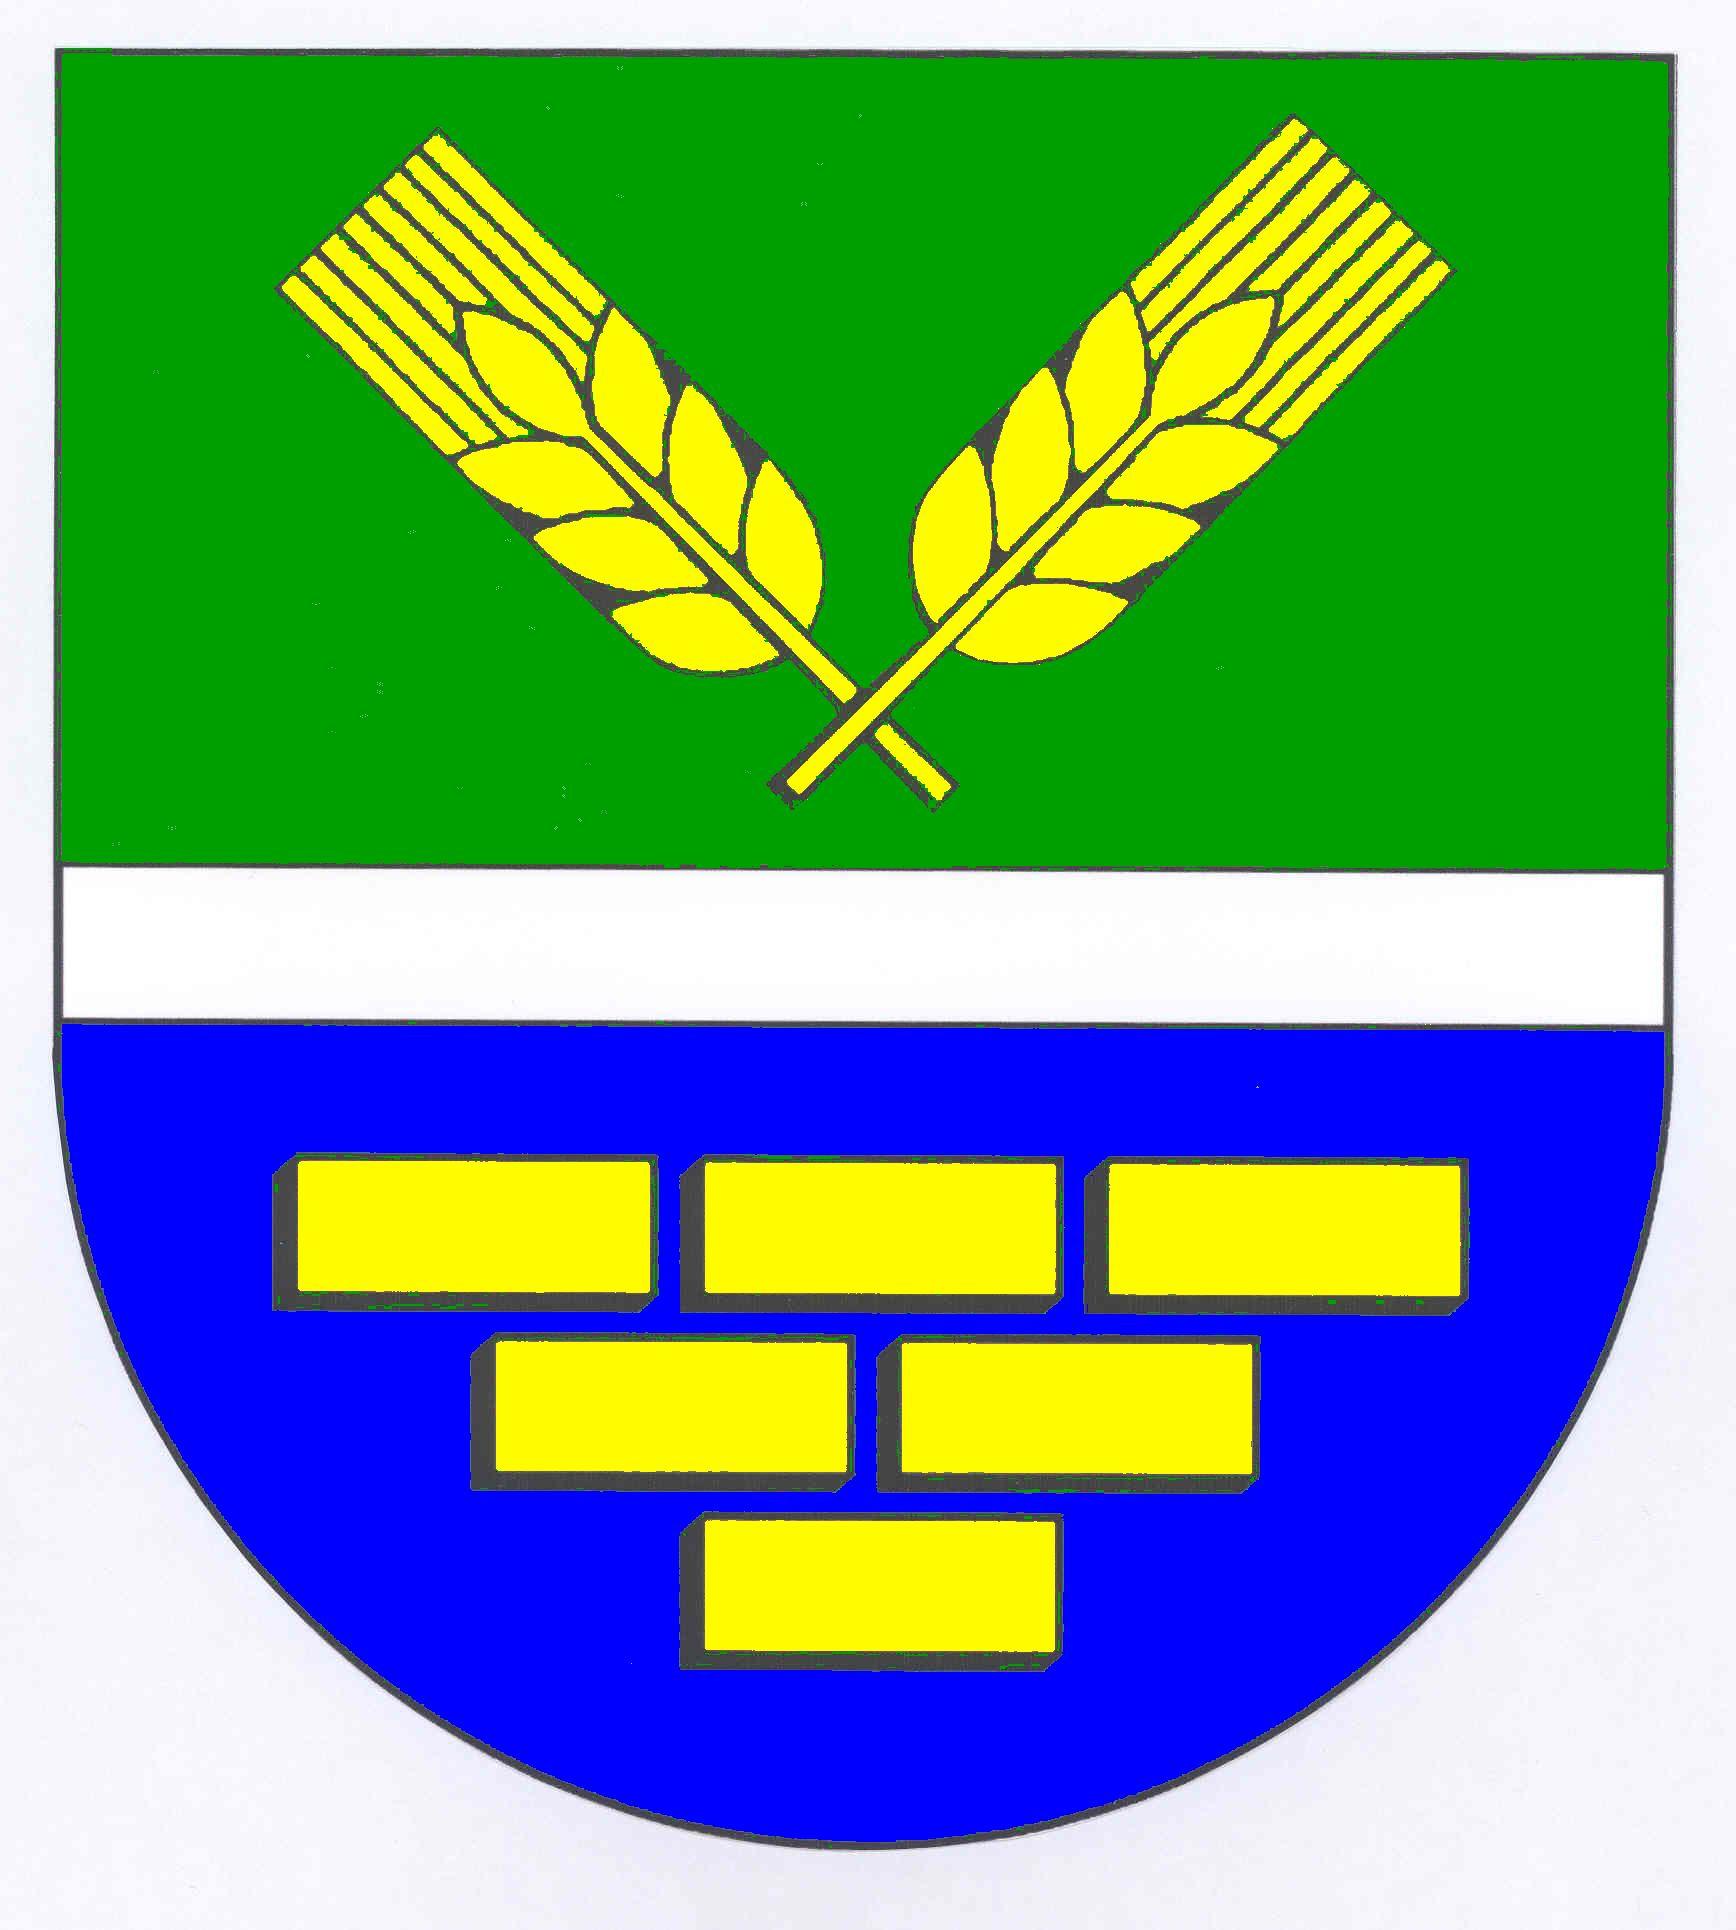 Wappen GemeindeRade, Kreis Rendsburg-Eckernförde